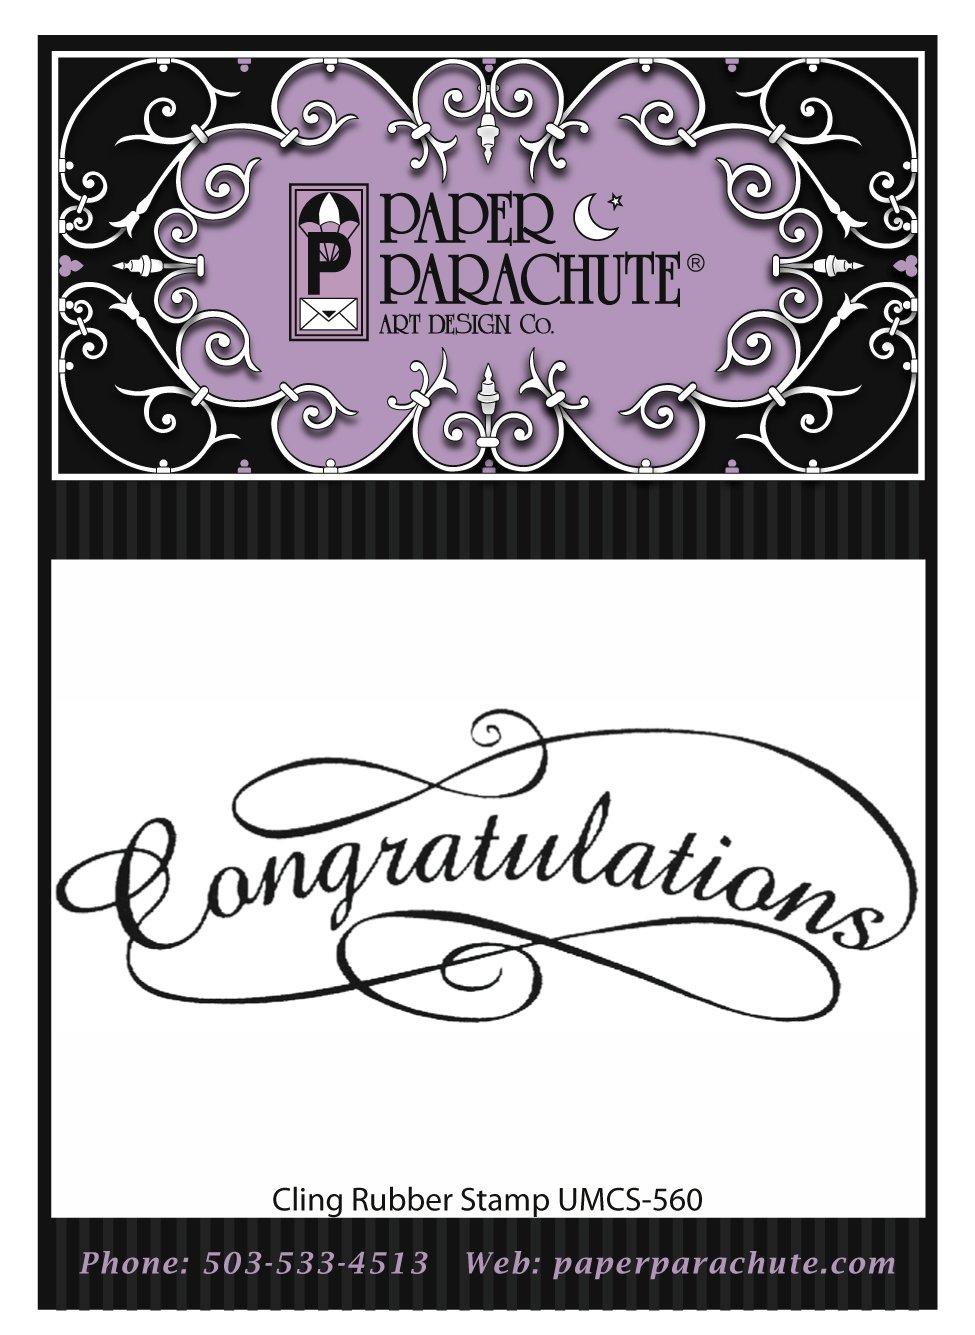 Paper Parachute Rubber Stamp - UMCS560